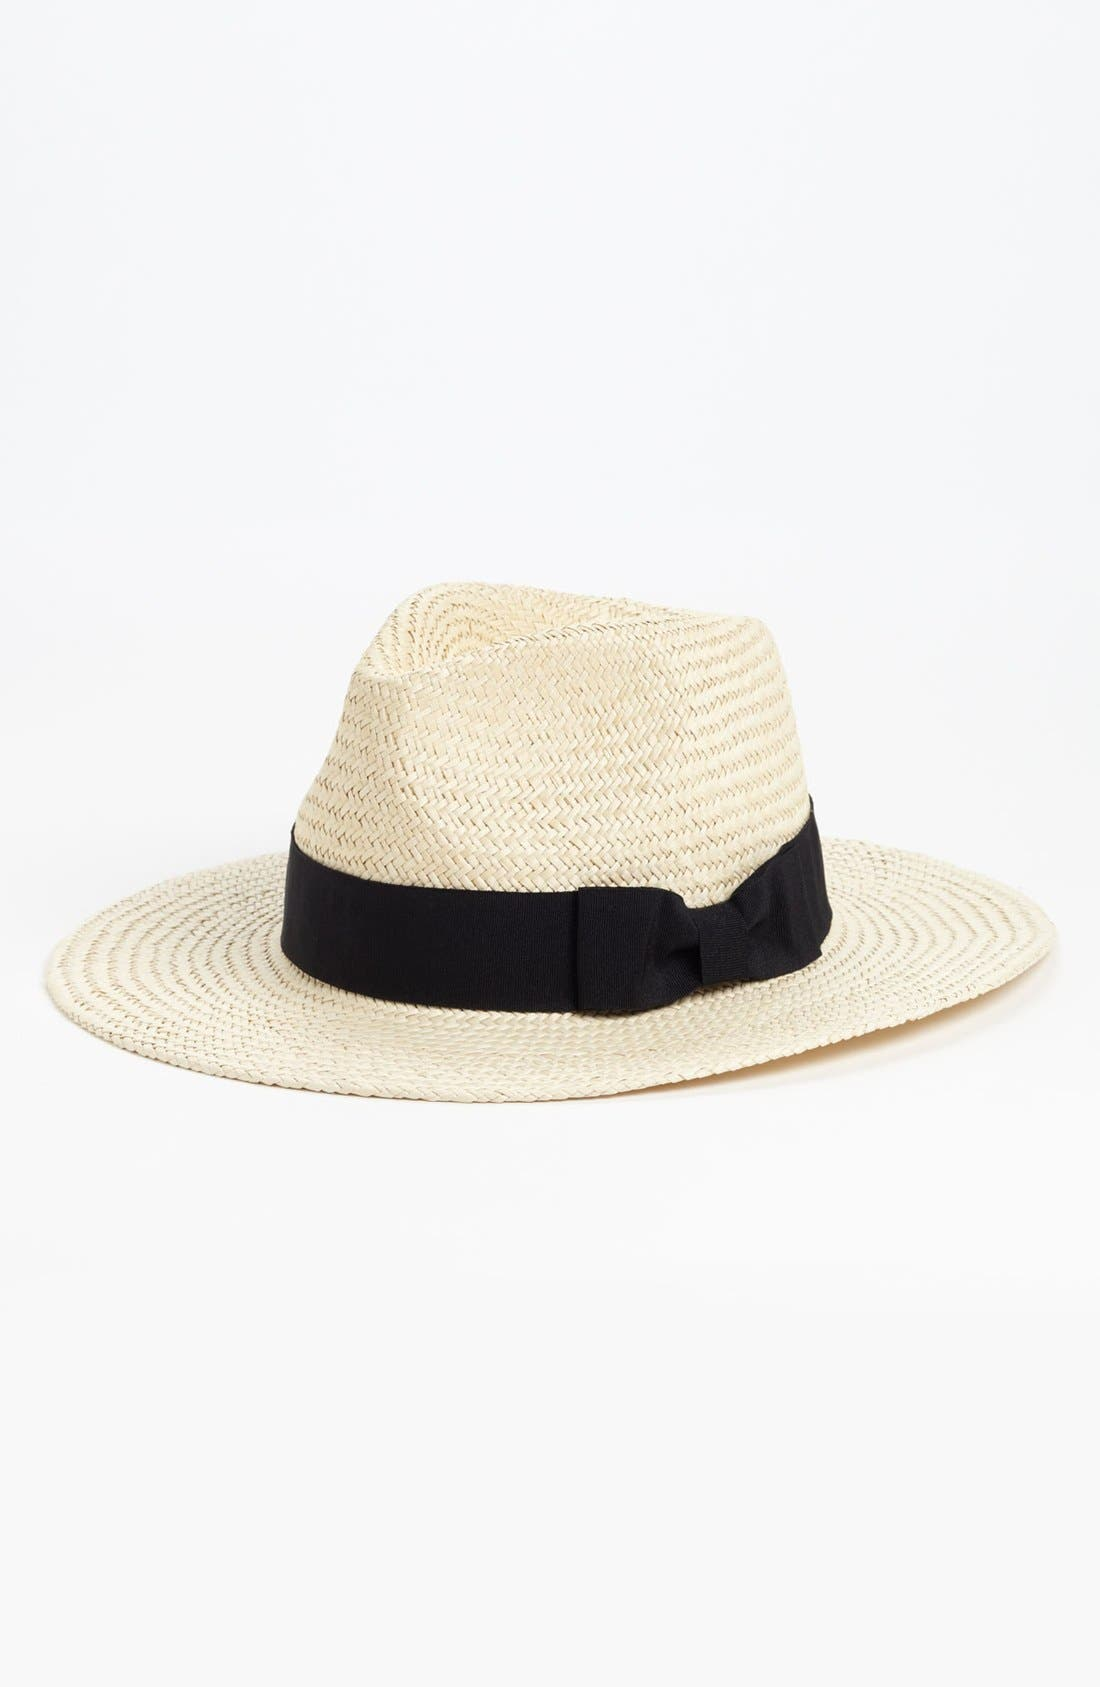 Main Image - Trouvé Straw Panama Hat